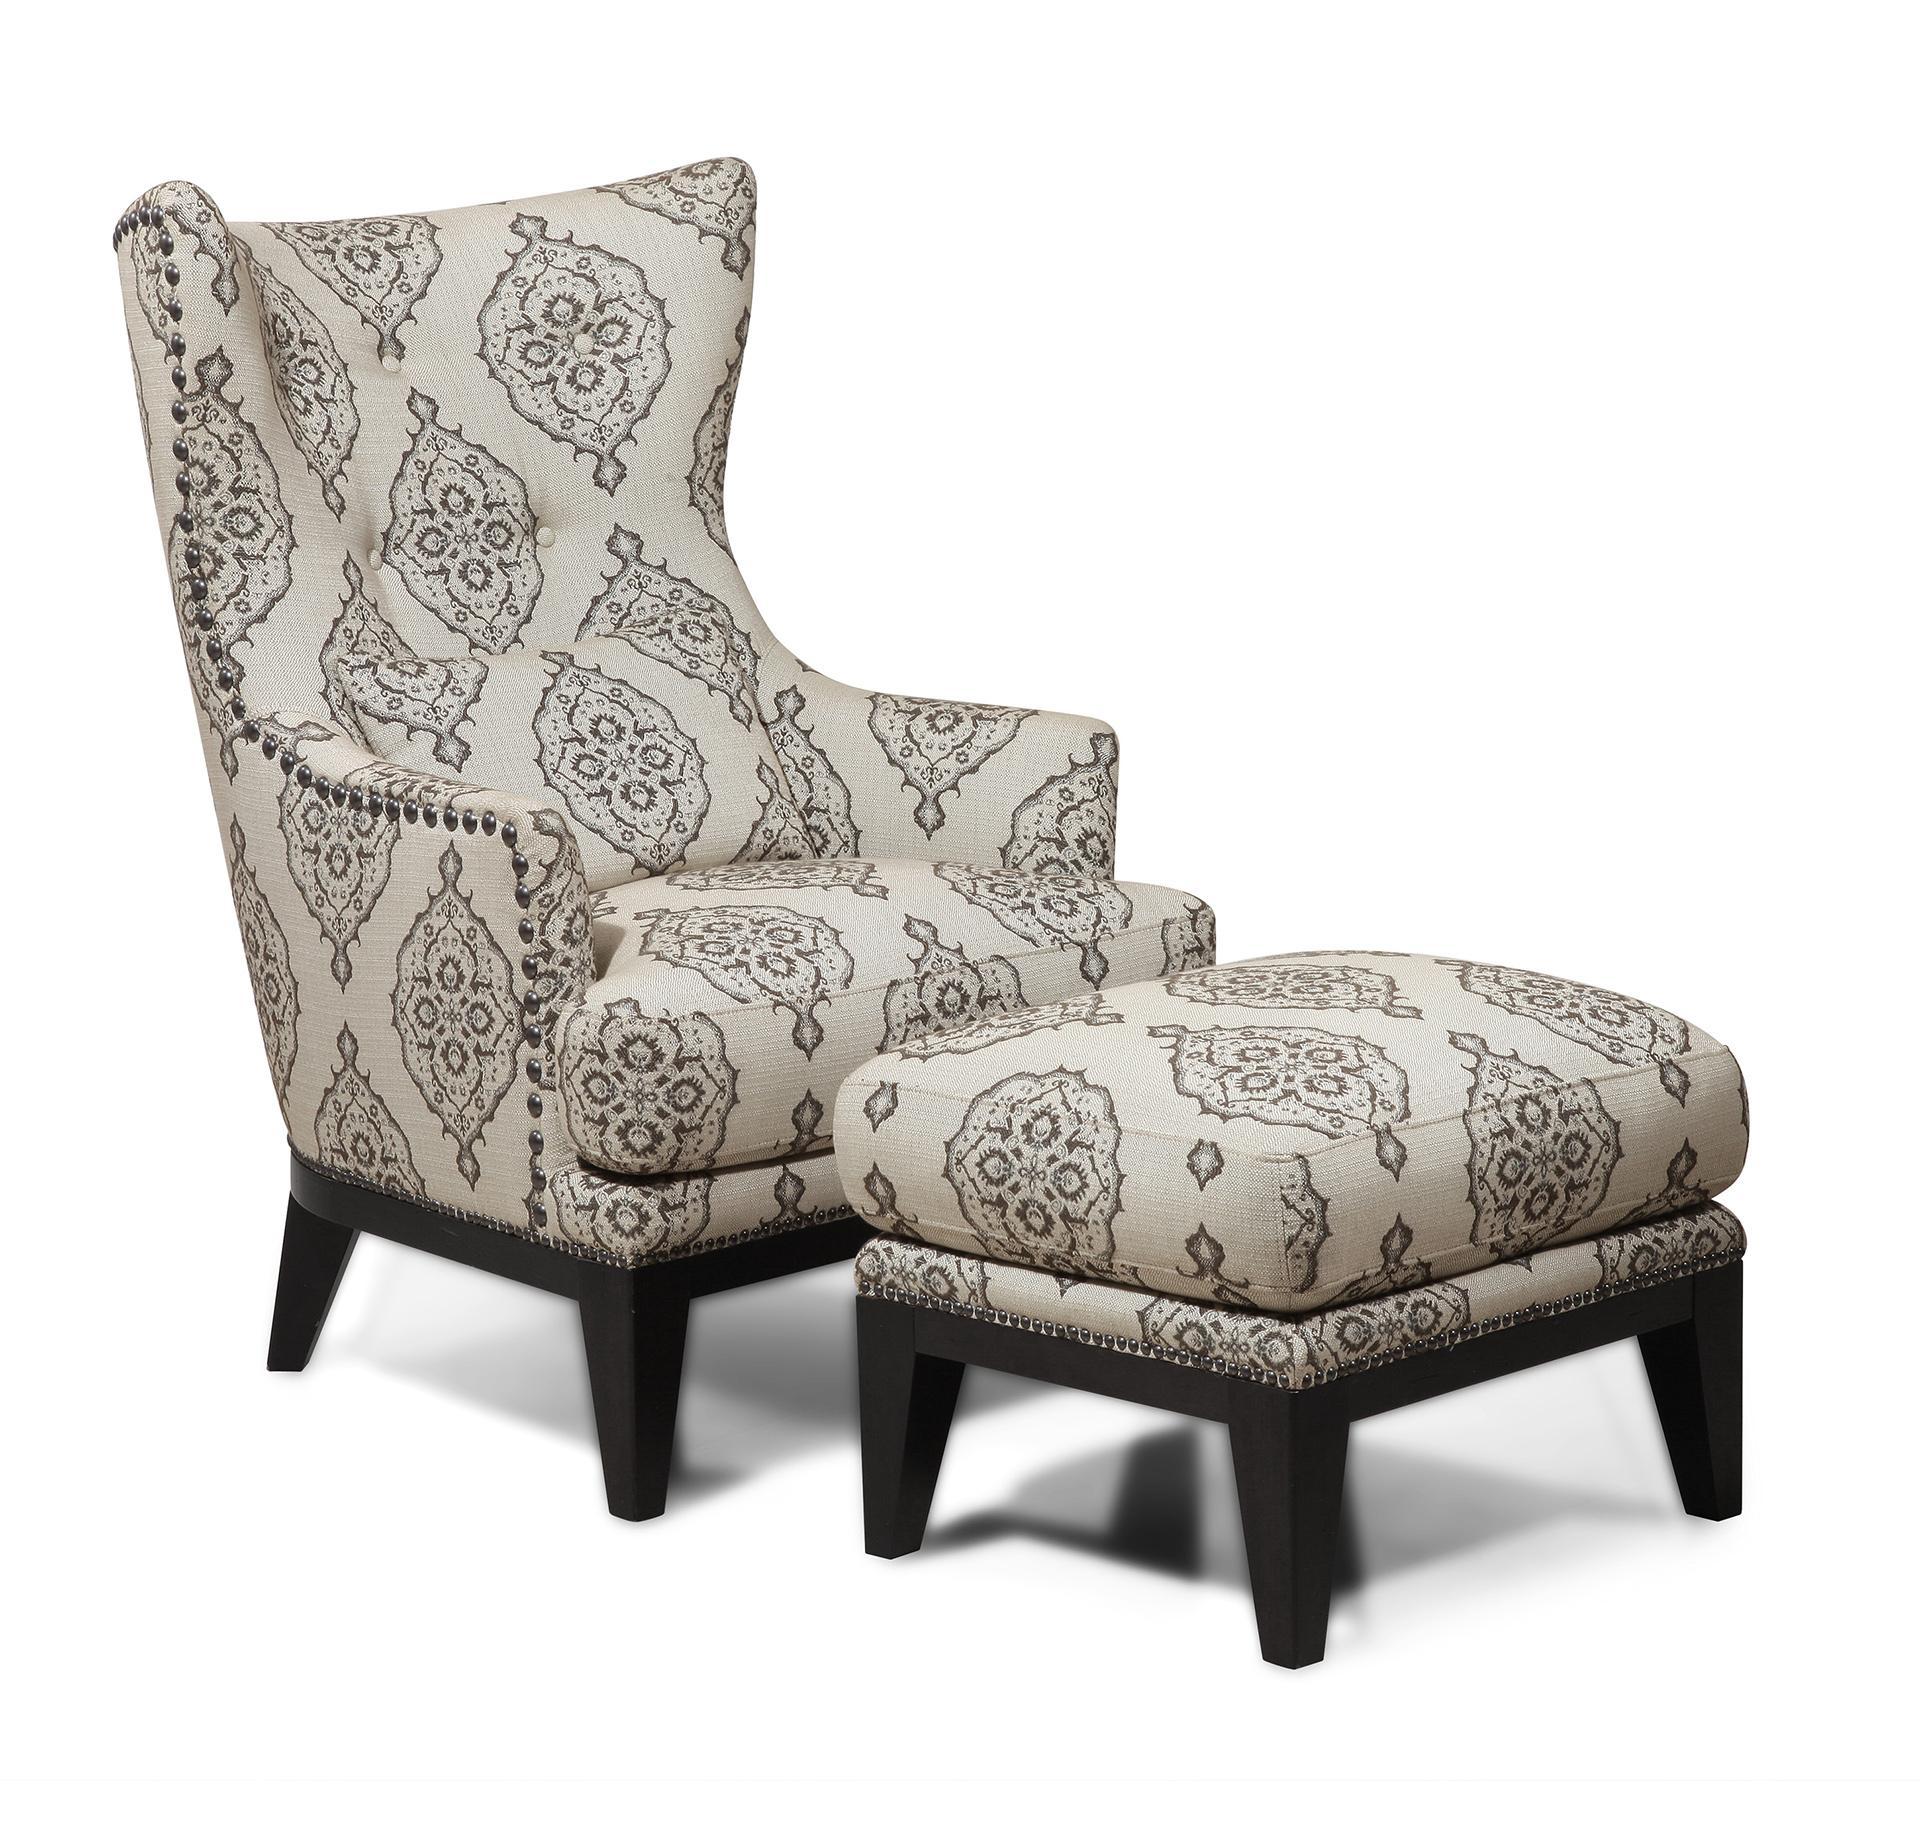 Brewster Accent Chair U0026 Ottoman